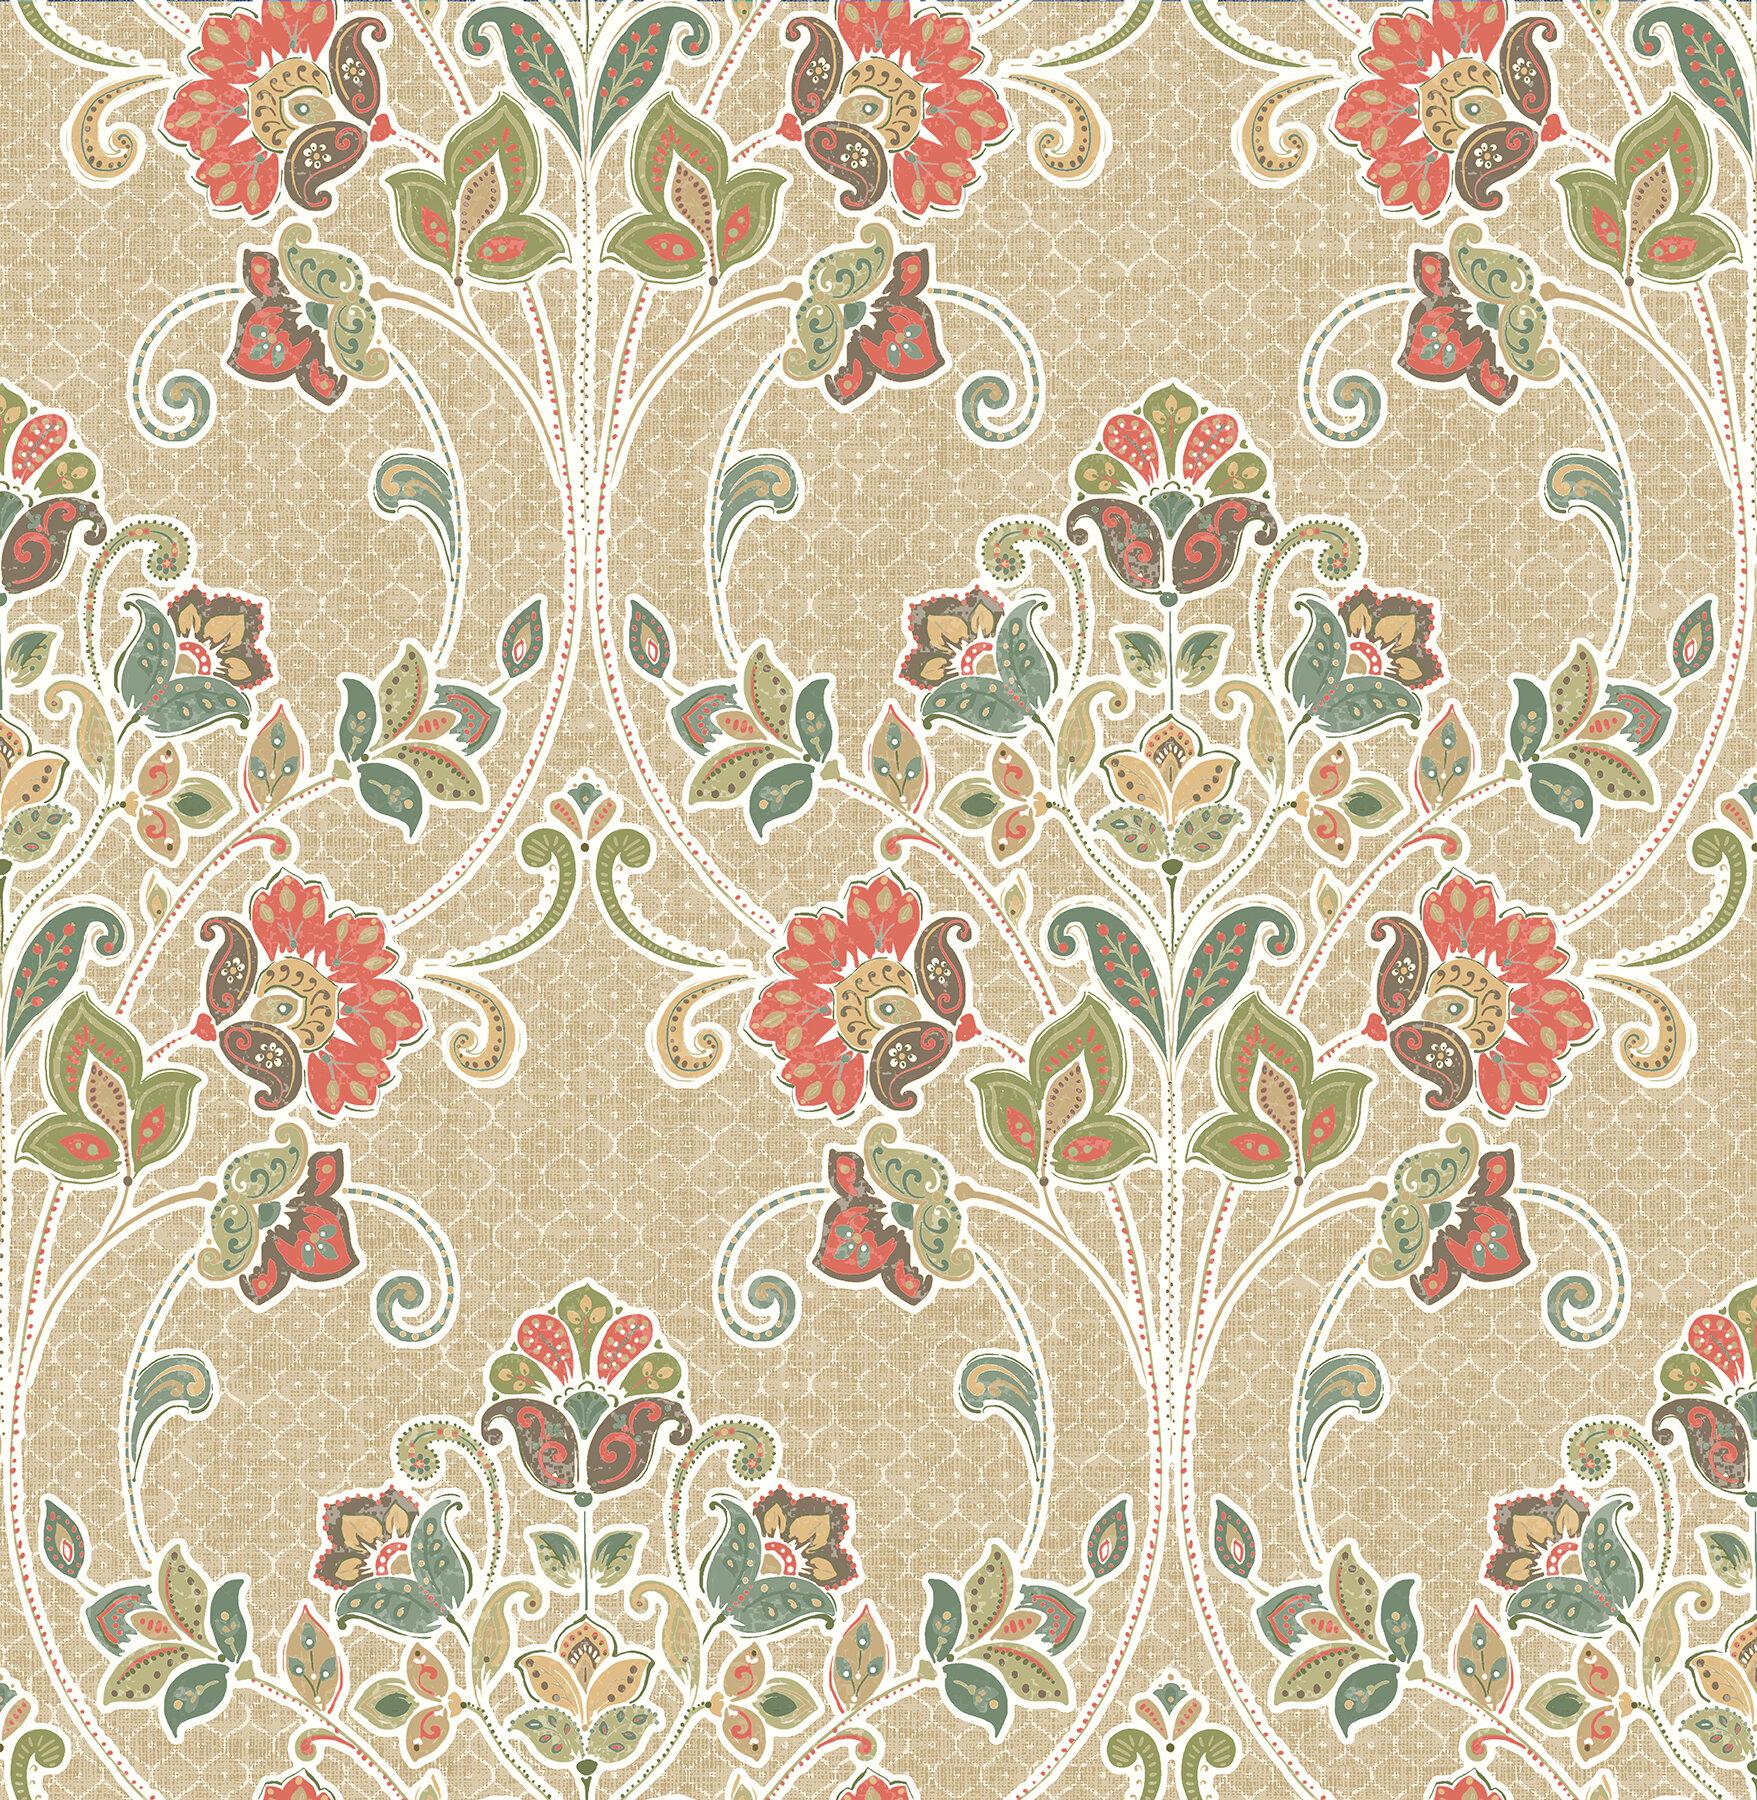 World Menagerie Elouise 33 X 20 5 Nouveau Wallpaper Roll